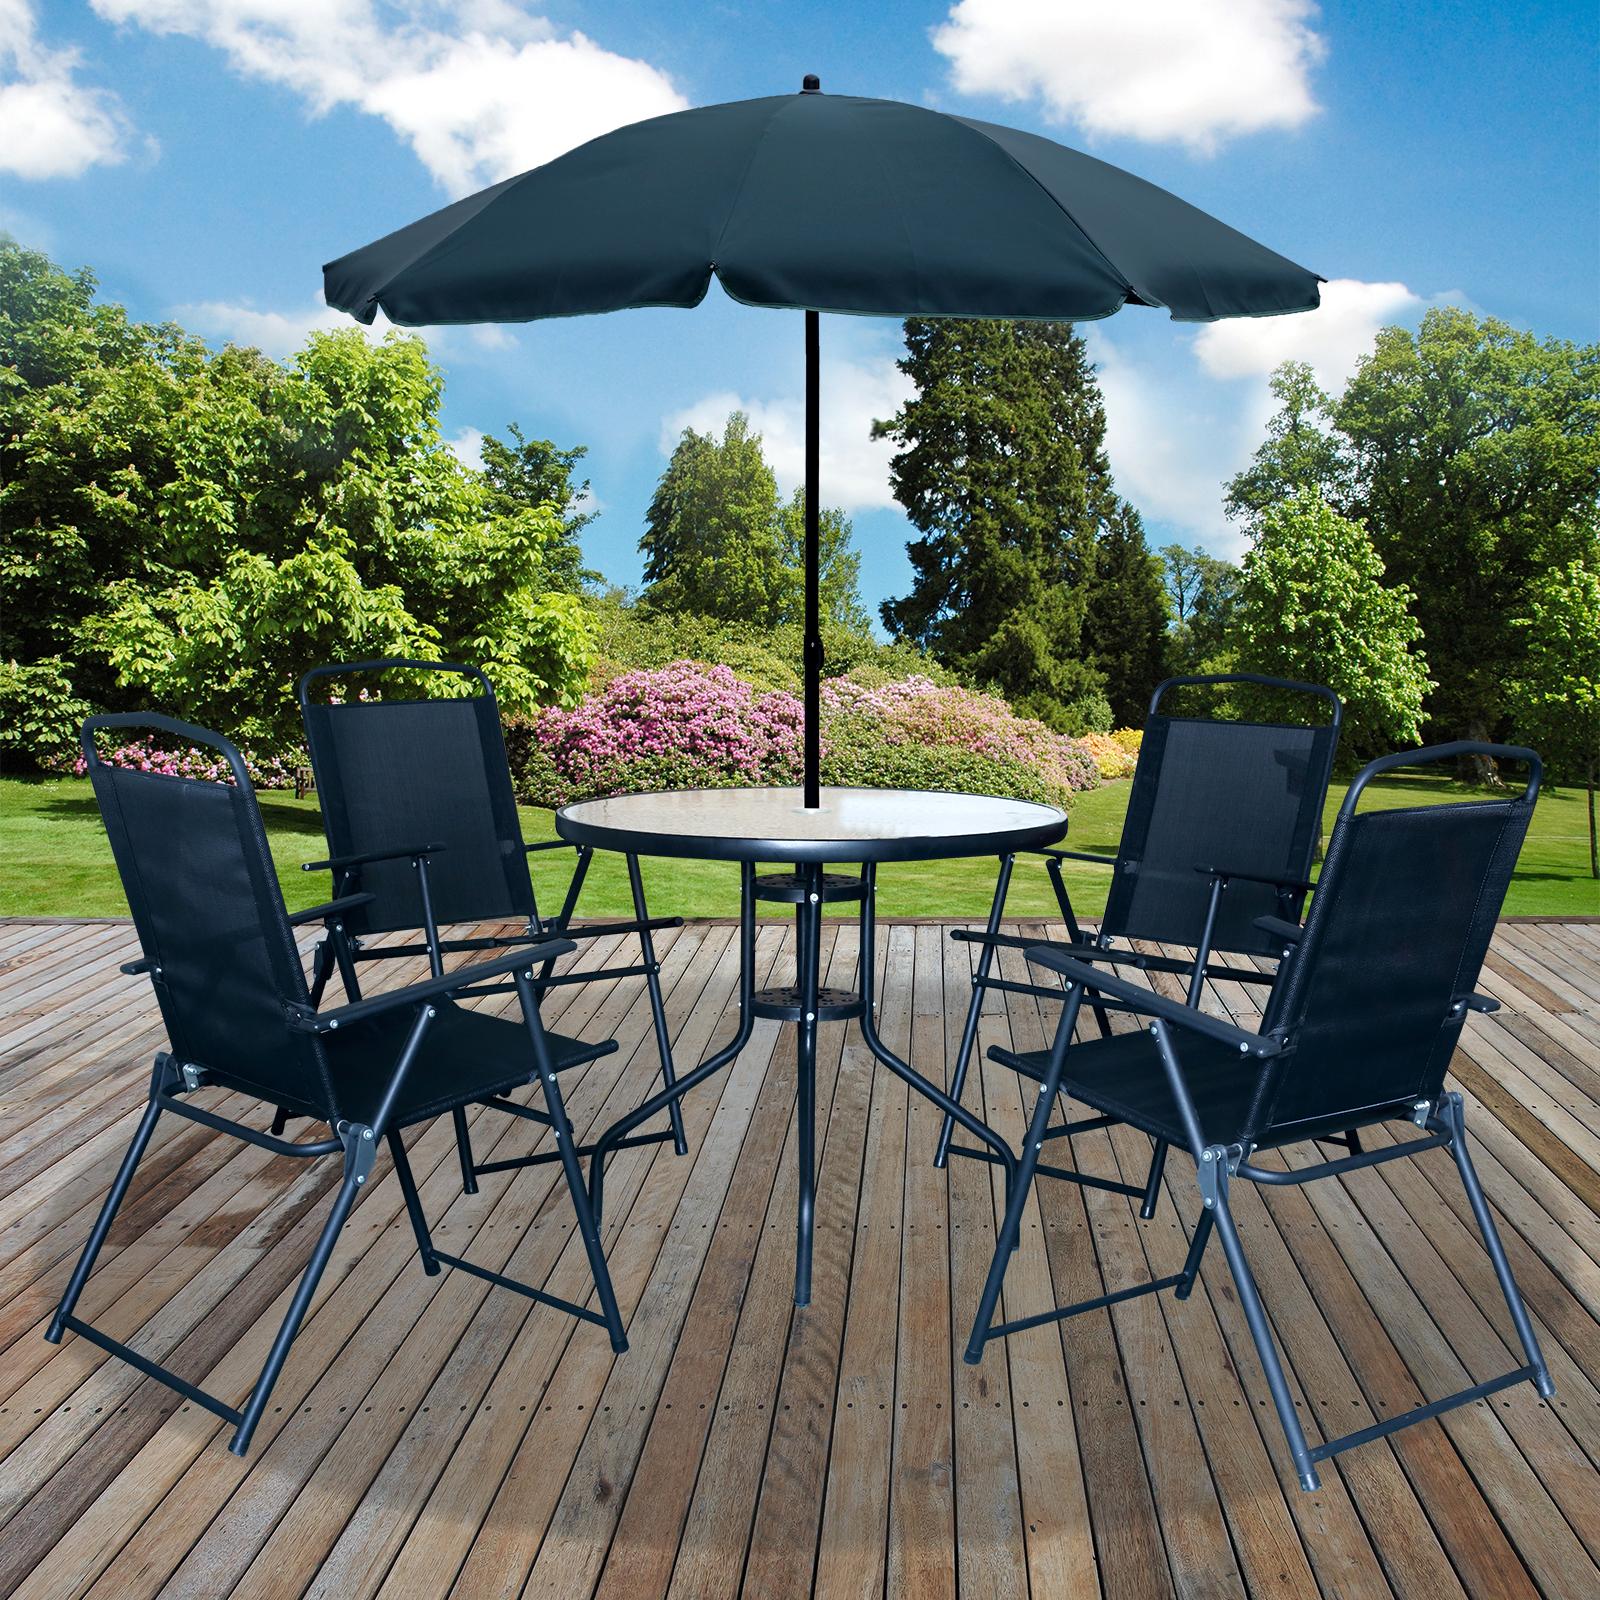 6pc Garden Patio Furniture Set Outdoor